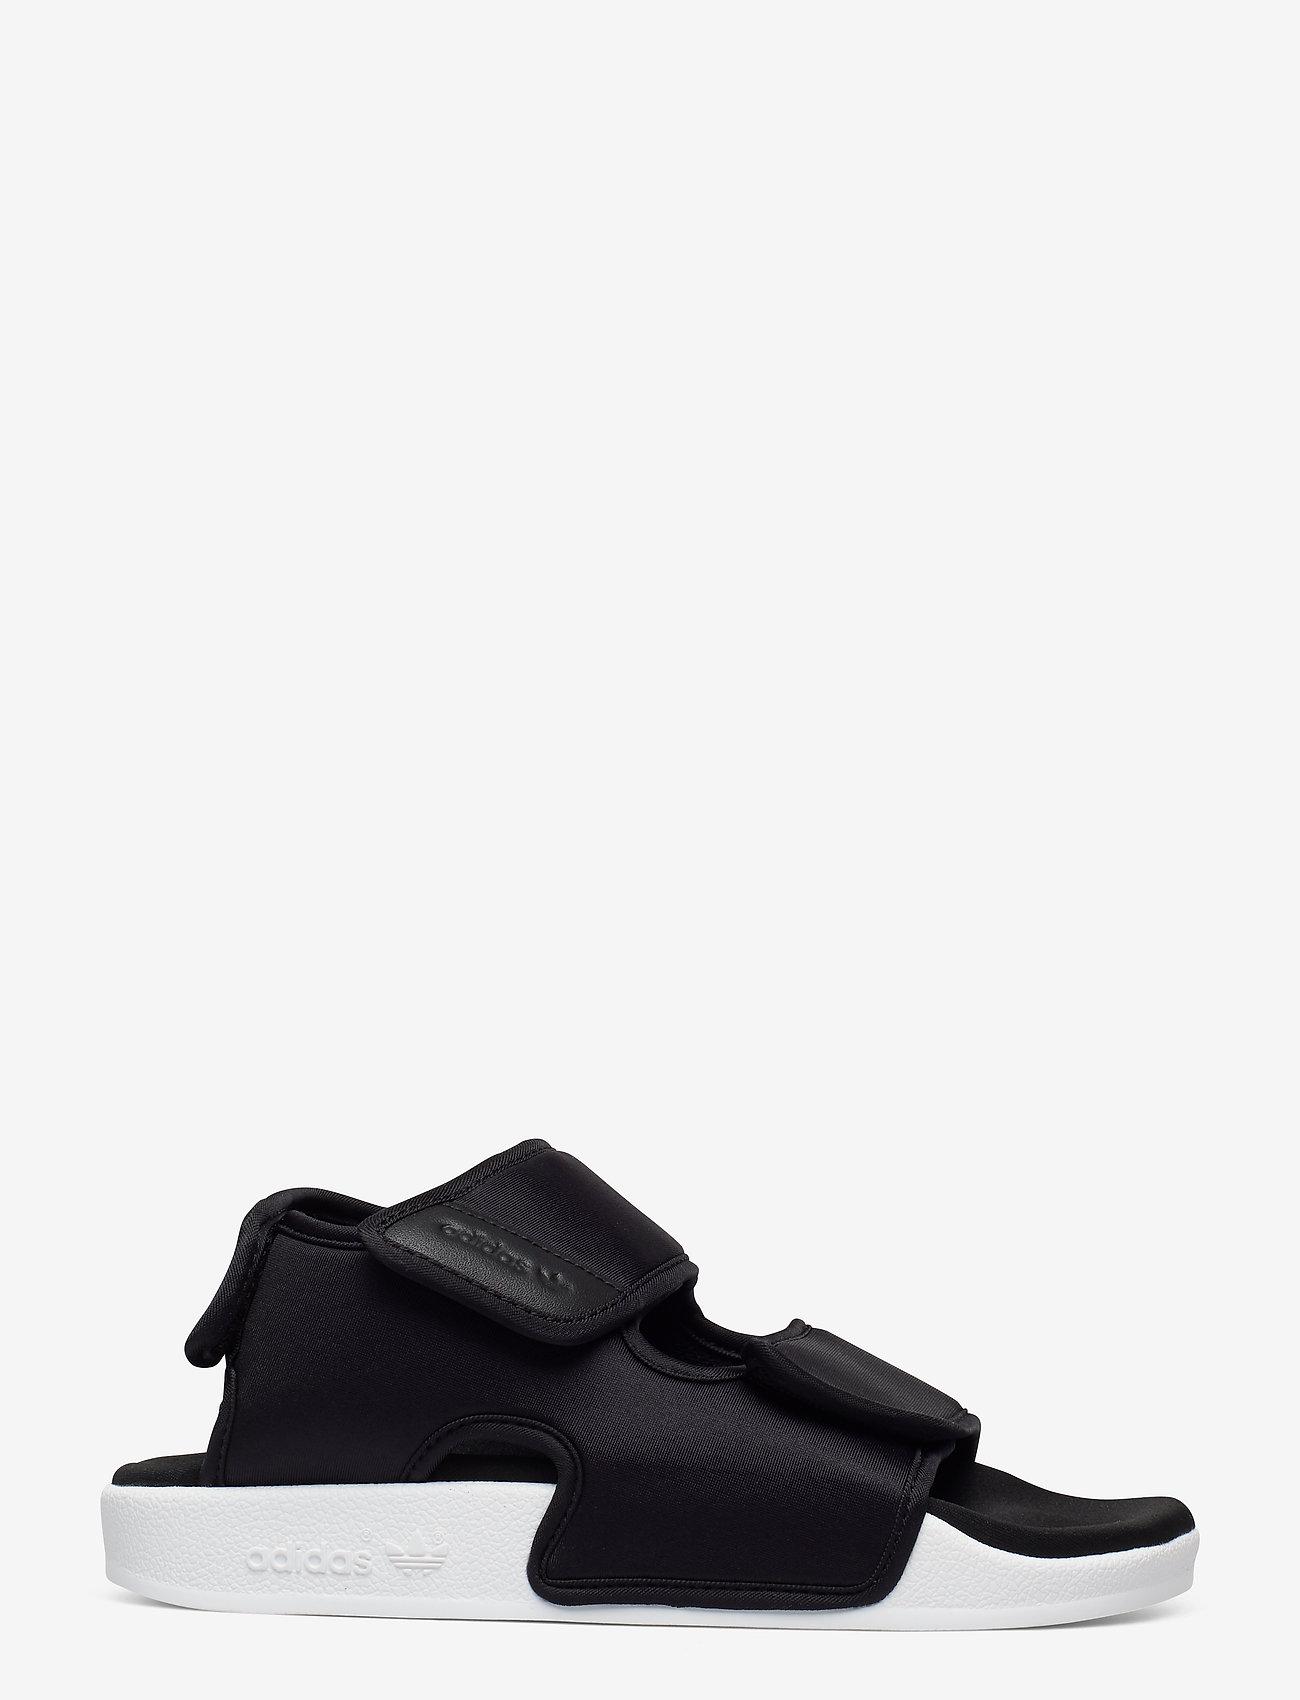 adidas Originals - ADILETTE SANDAL 3.0 - płaskie sandały - cblack/cblack/ftwwht - 1